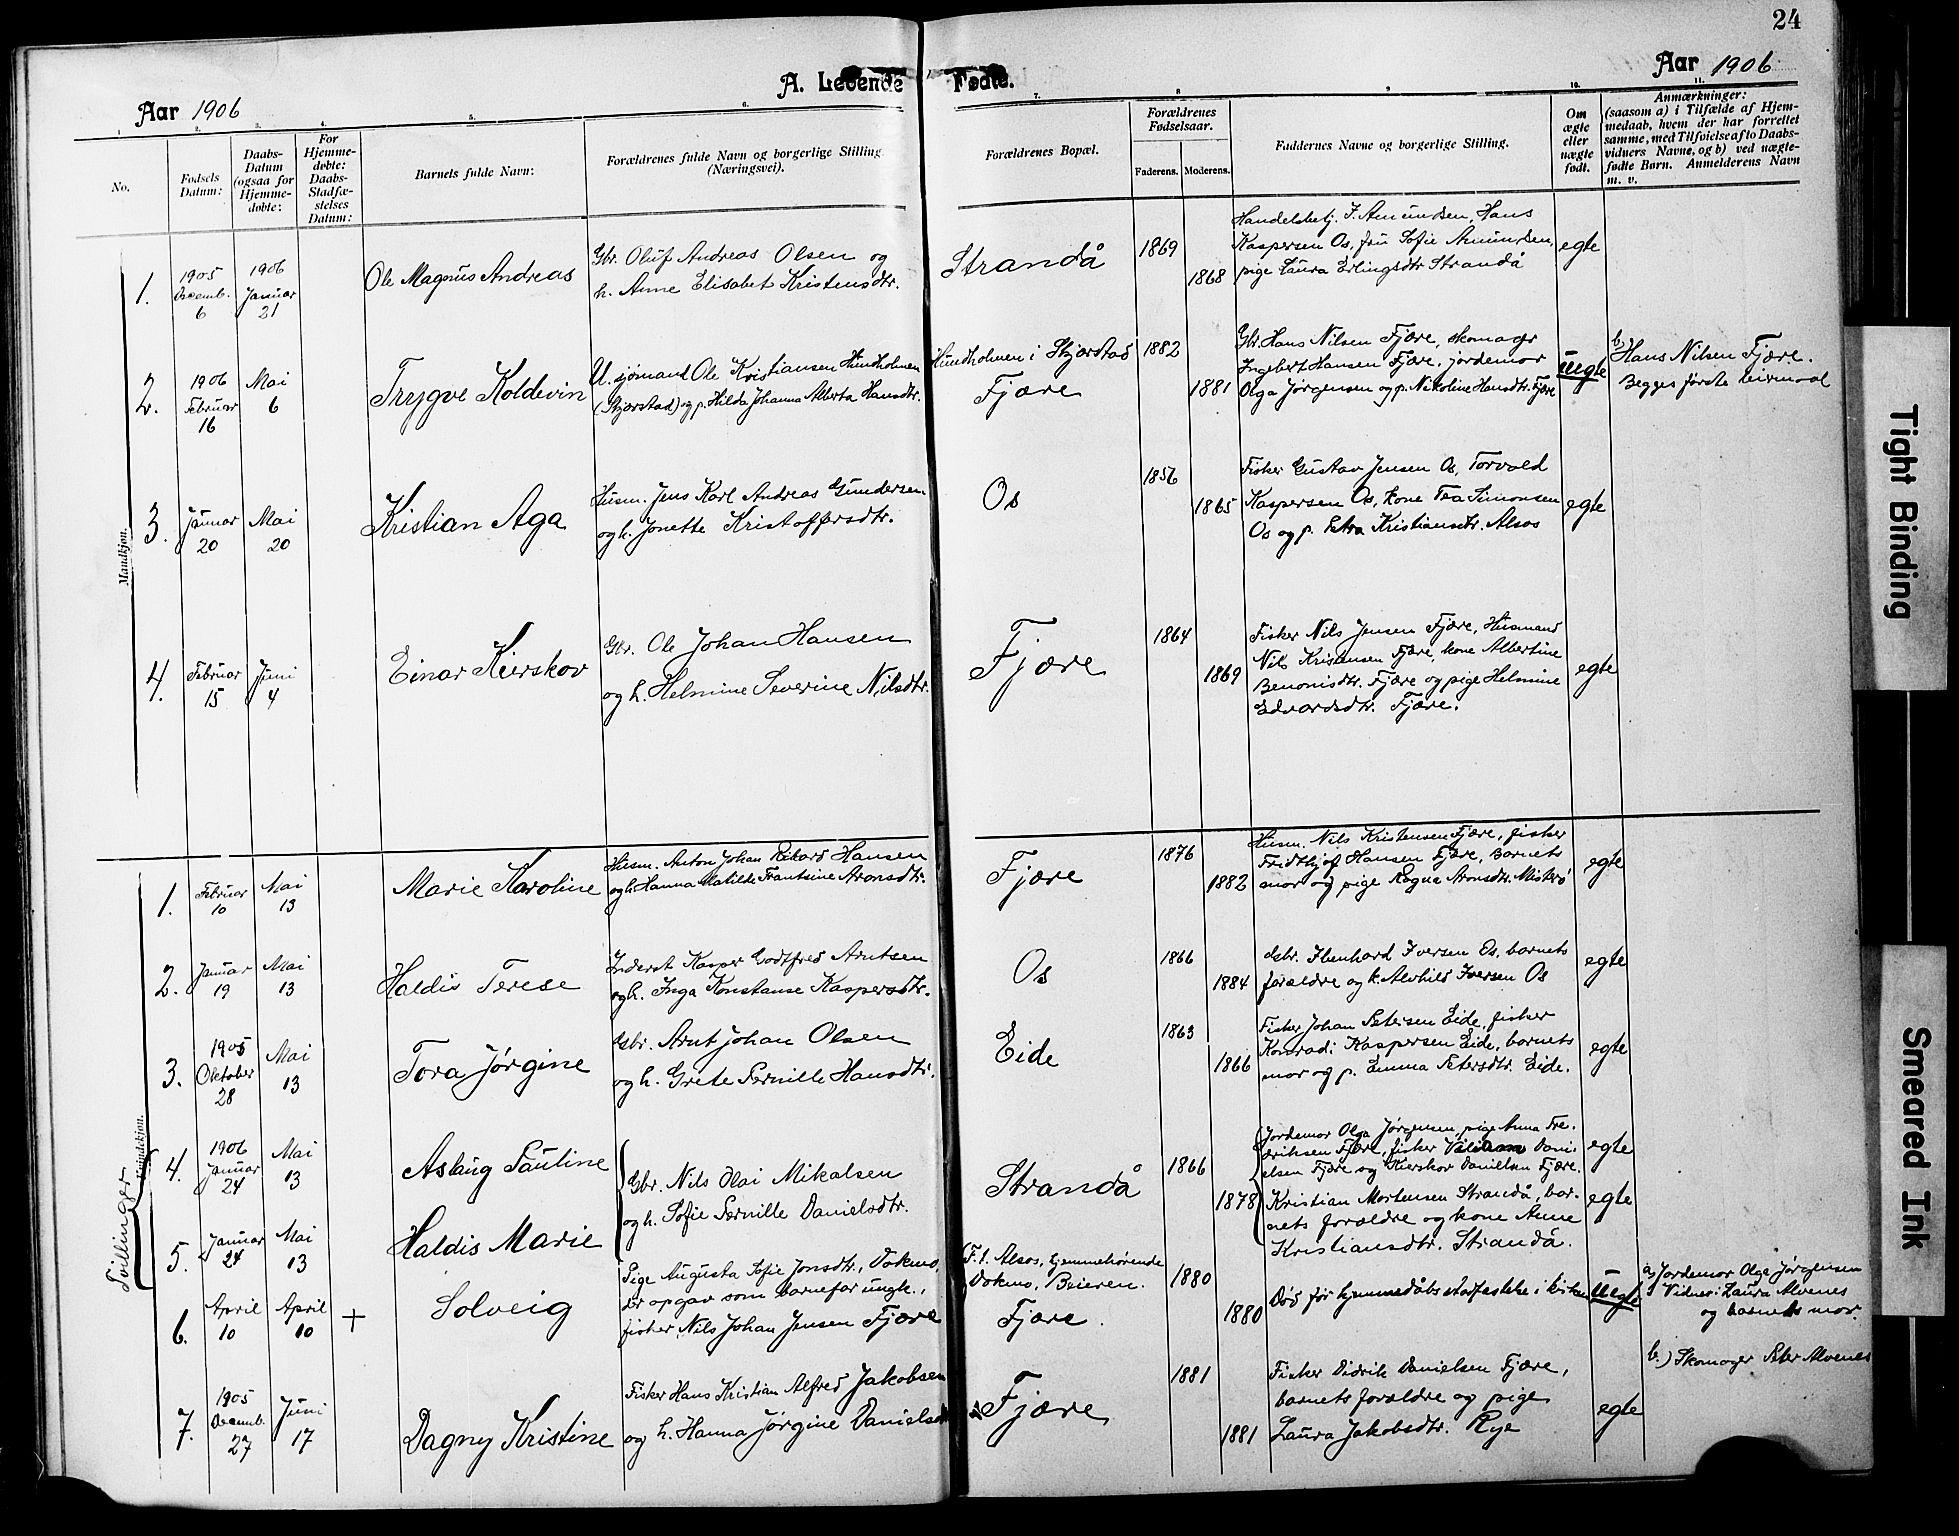 SAT, Ministerialprotokoller, klokkerbøker og fødselsregistre - Nordland, 803/L0077: Klokkerbok nr. 803C04, 1897-1930, s. 24